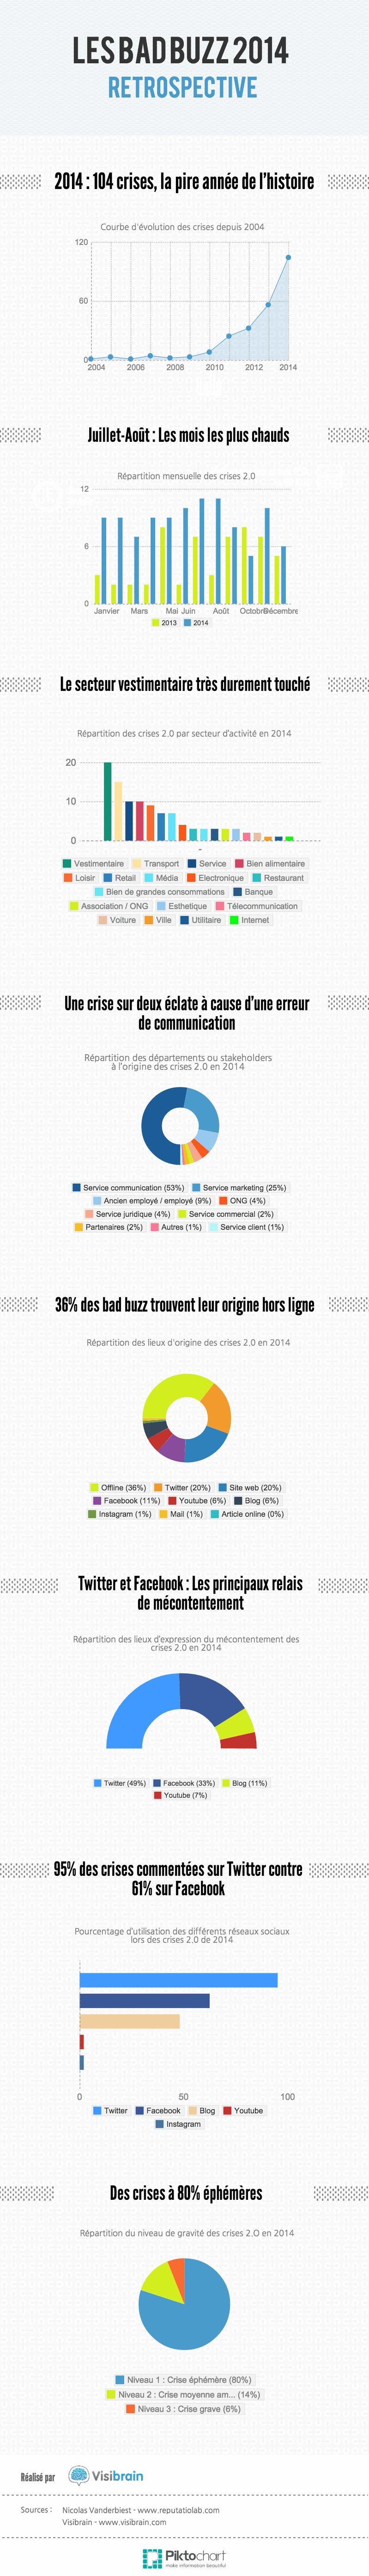 Infographie-bad-buzz-2014-retrospective